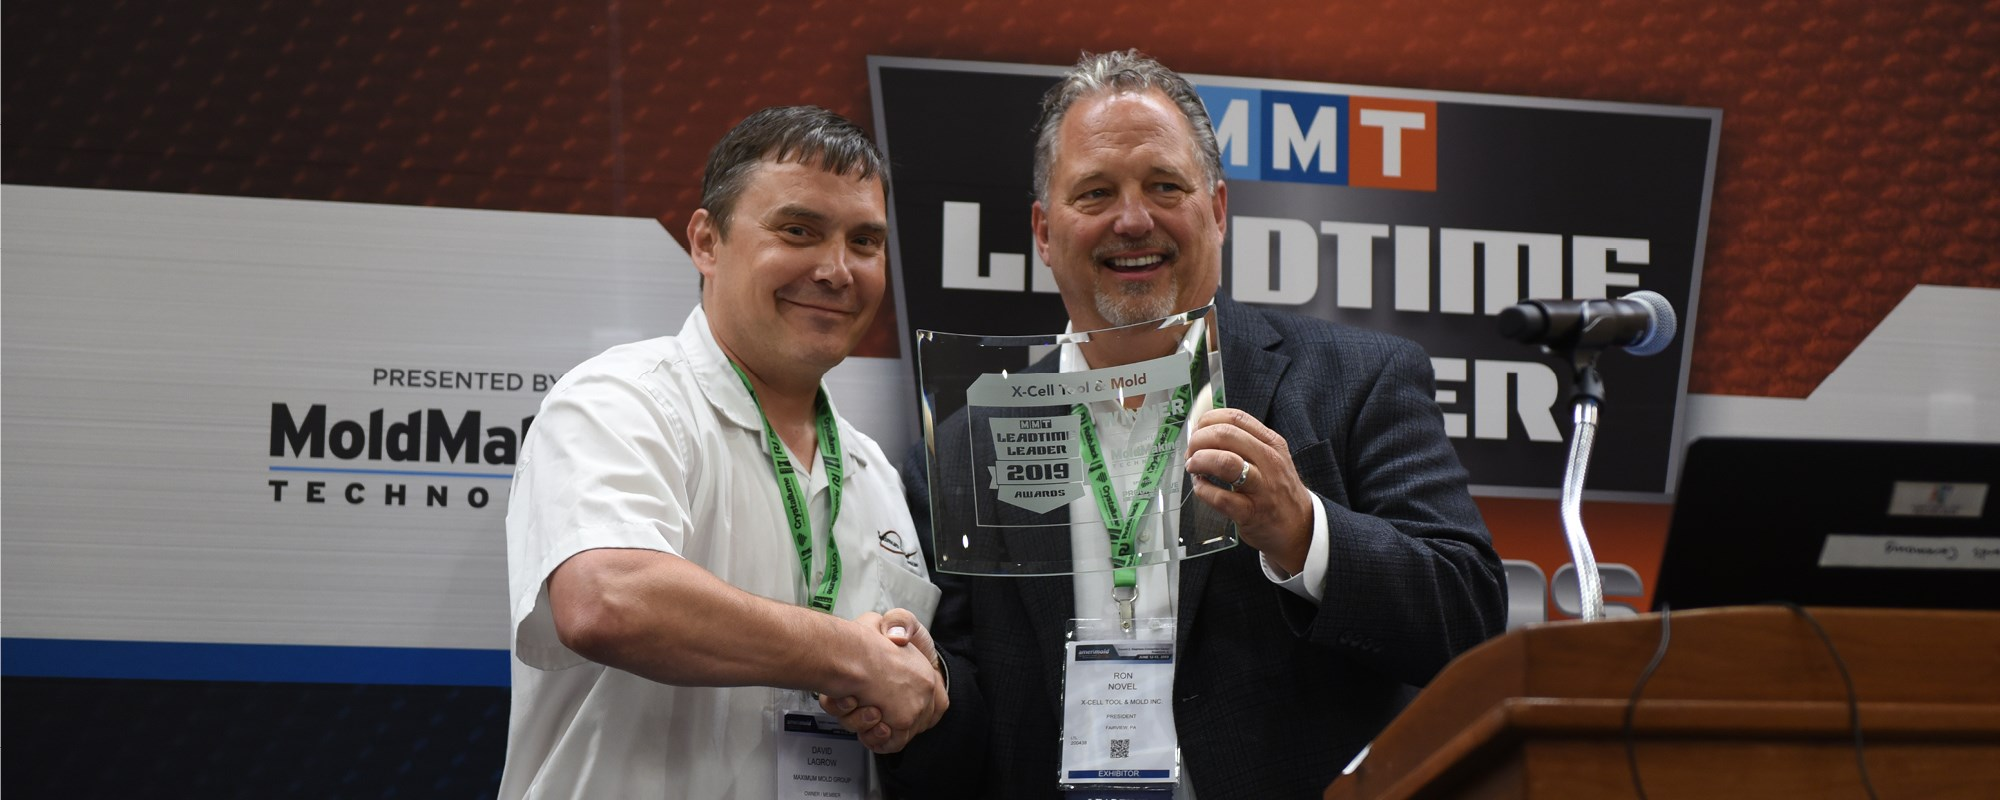 The former winner of the Leadtime Leader Award congratulating the new winner.